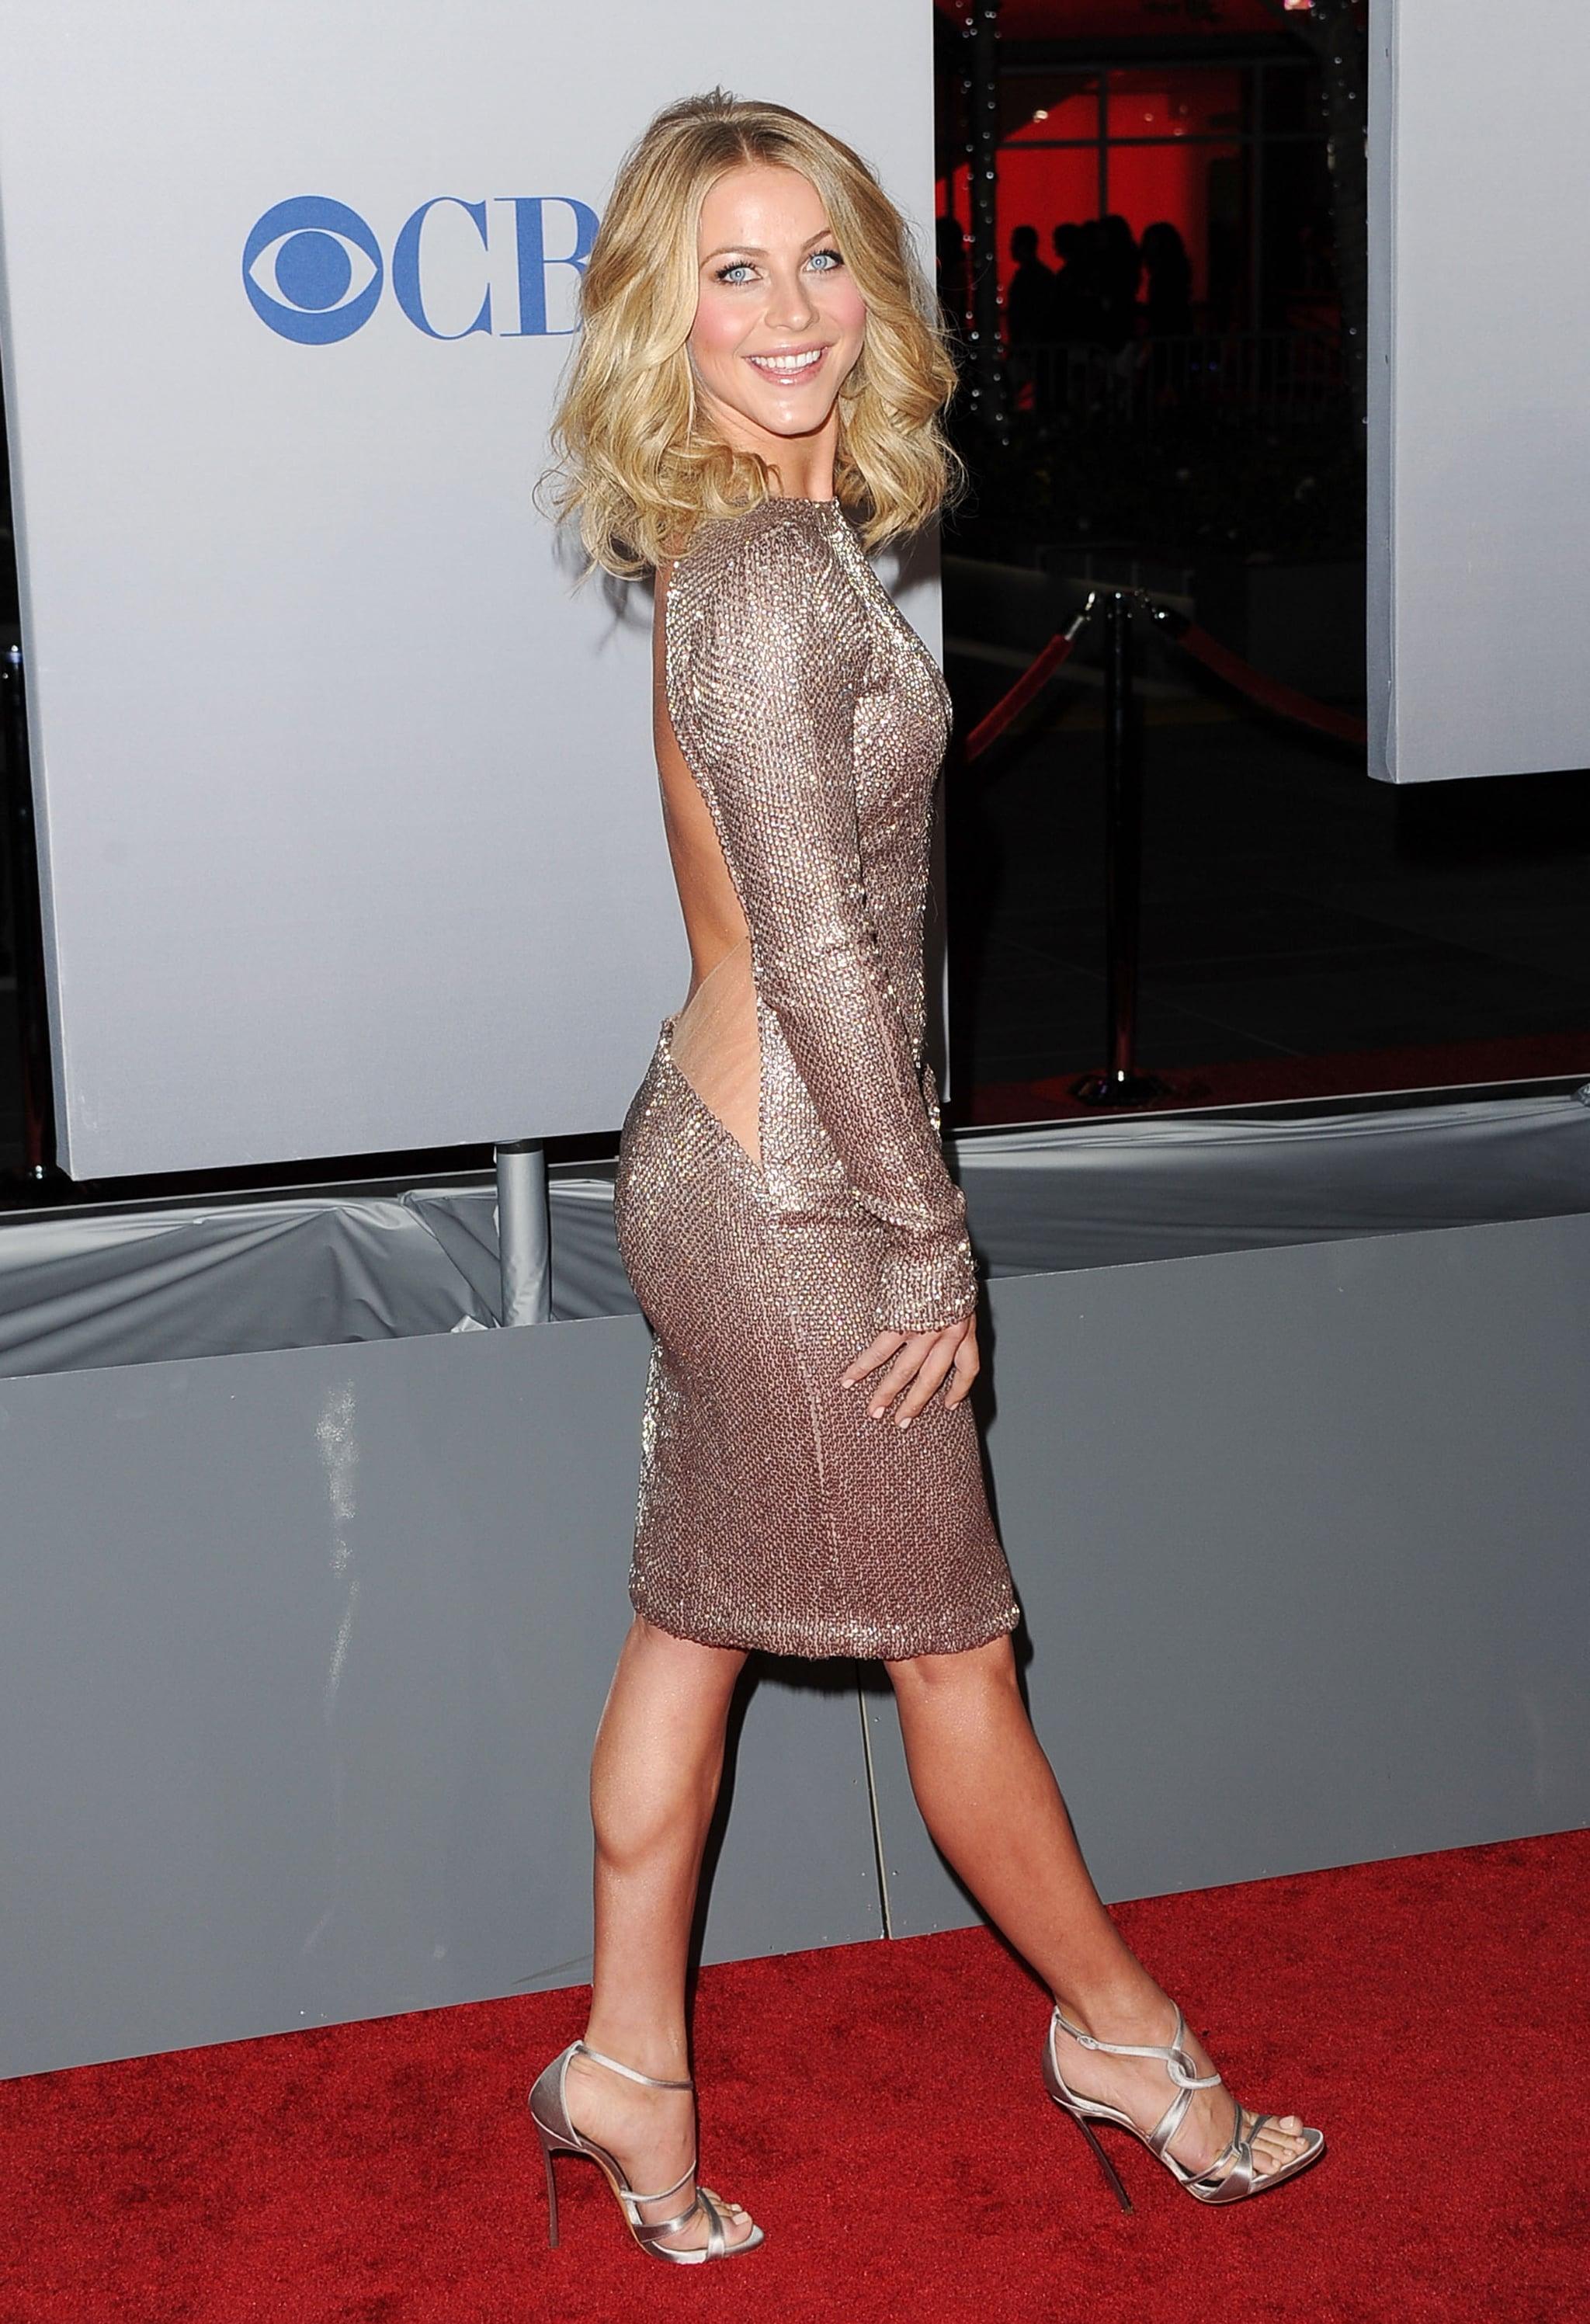 Julianne Hough had on a backless dress.